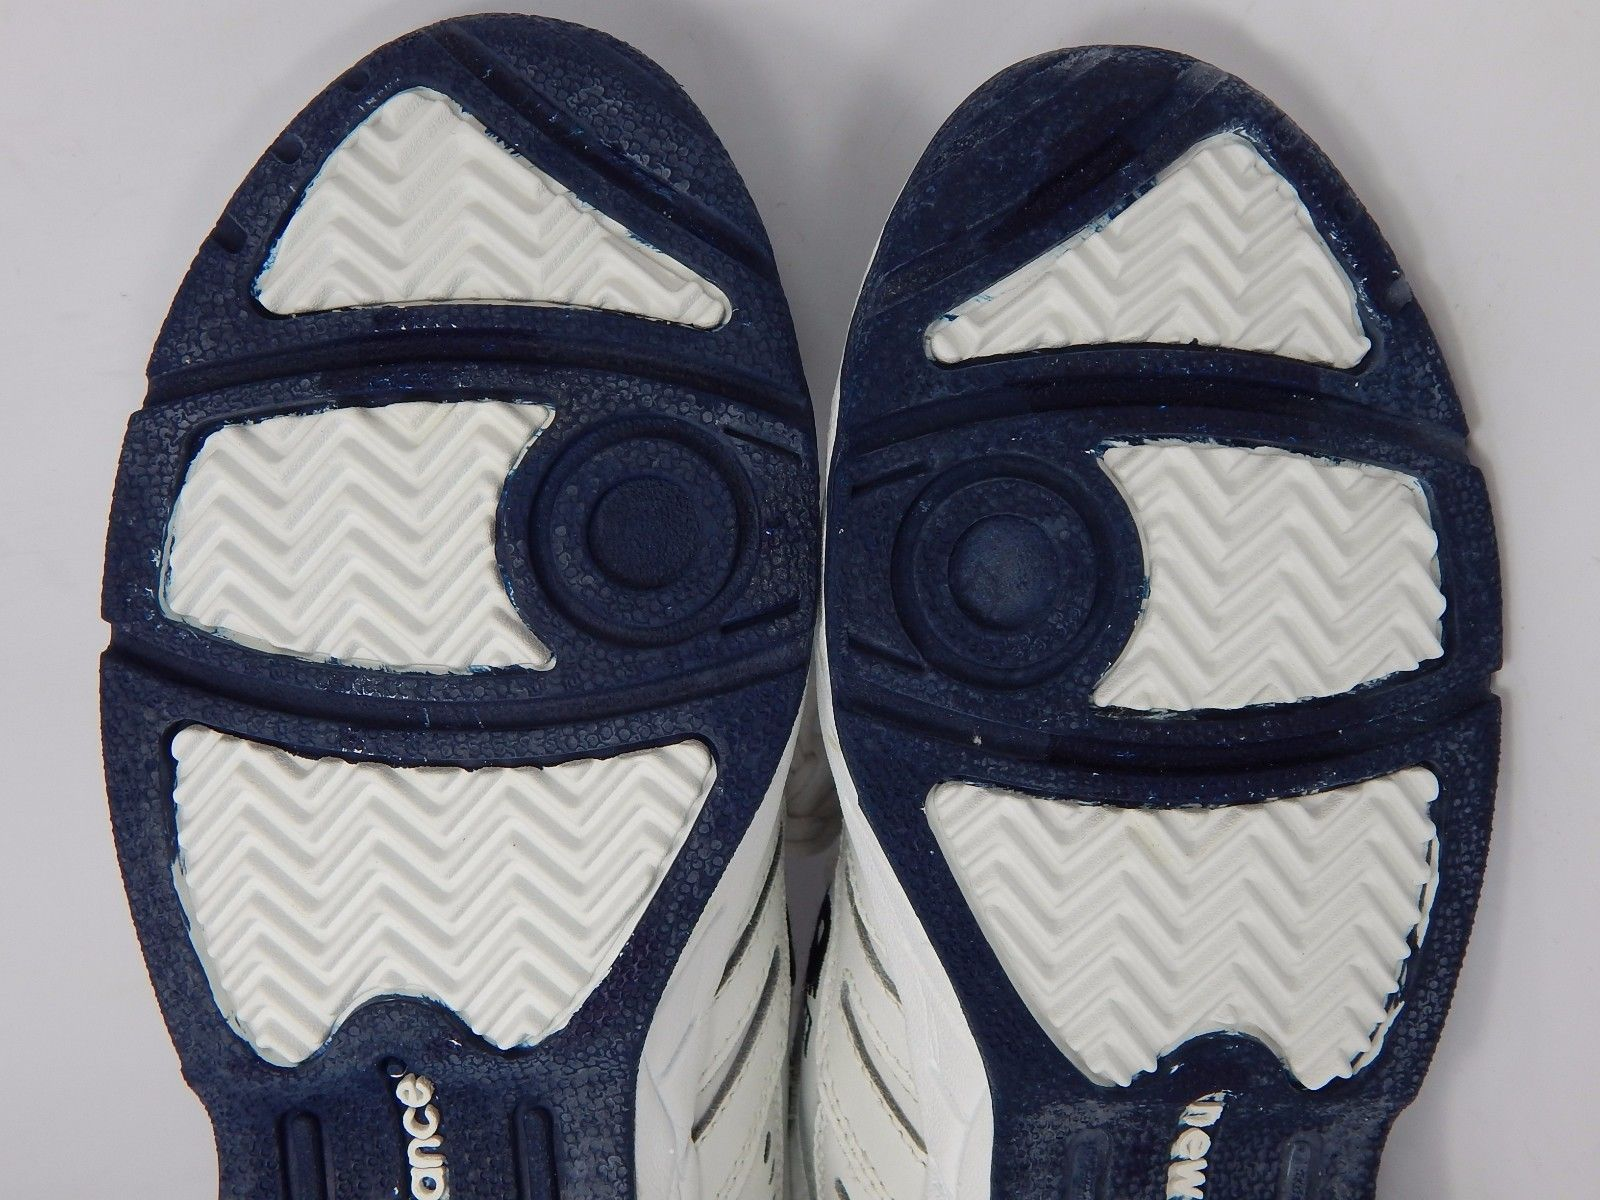 New Balance 525 Women's Tennis Court Shoes Size US 7 M (B) EU 37.5 White WCT525